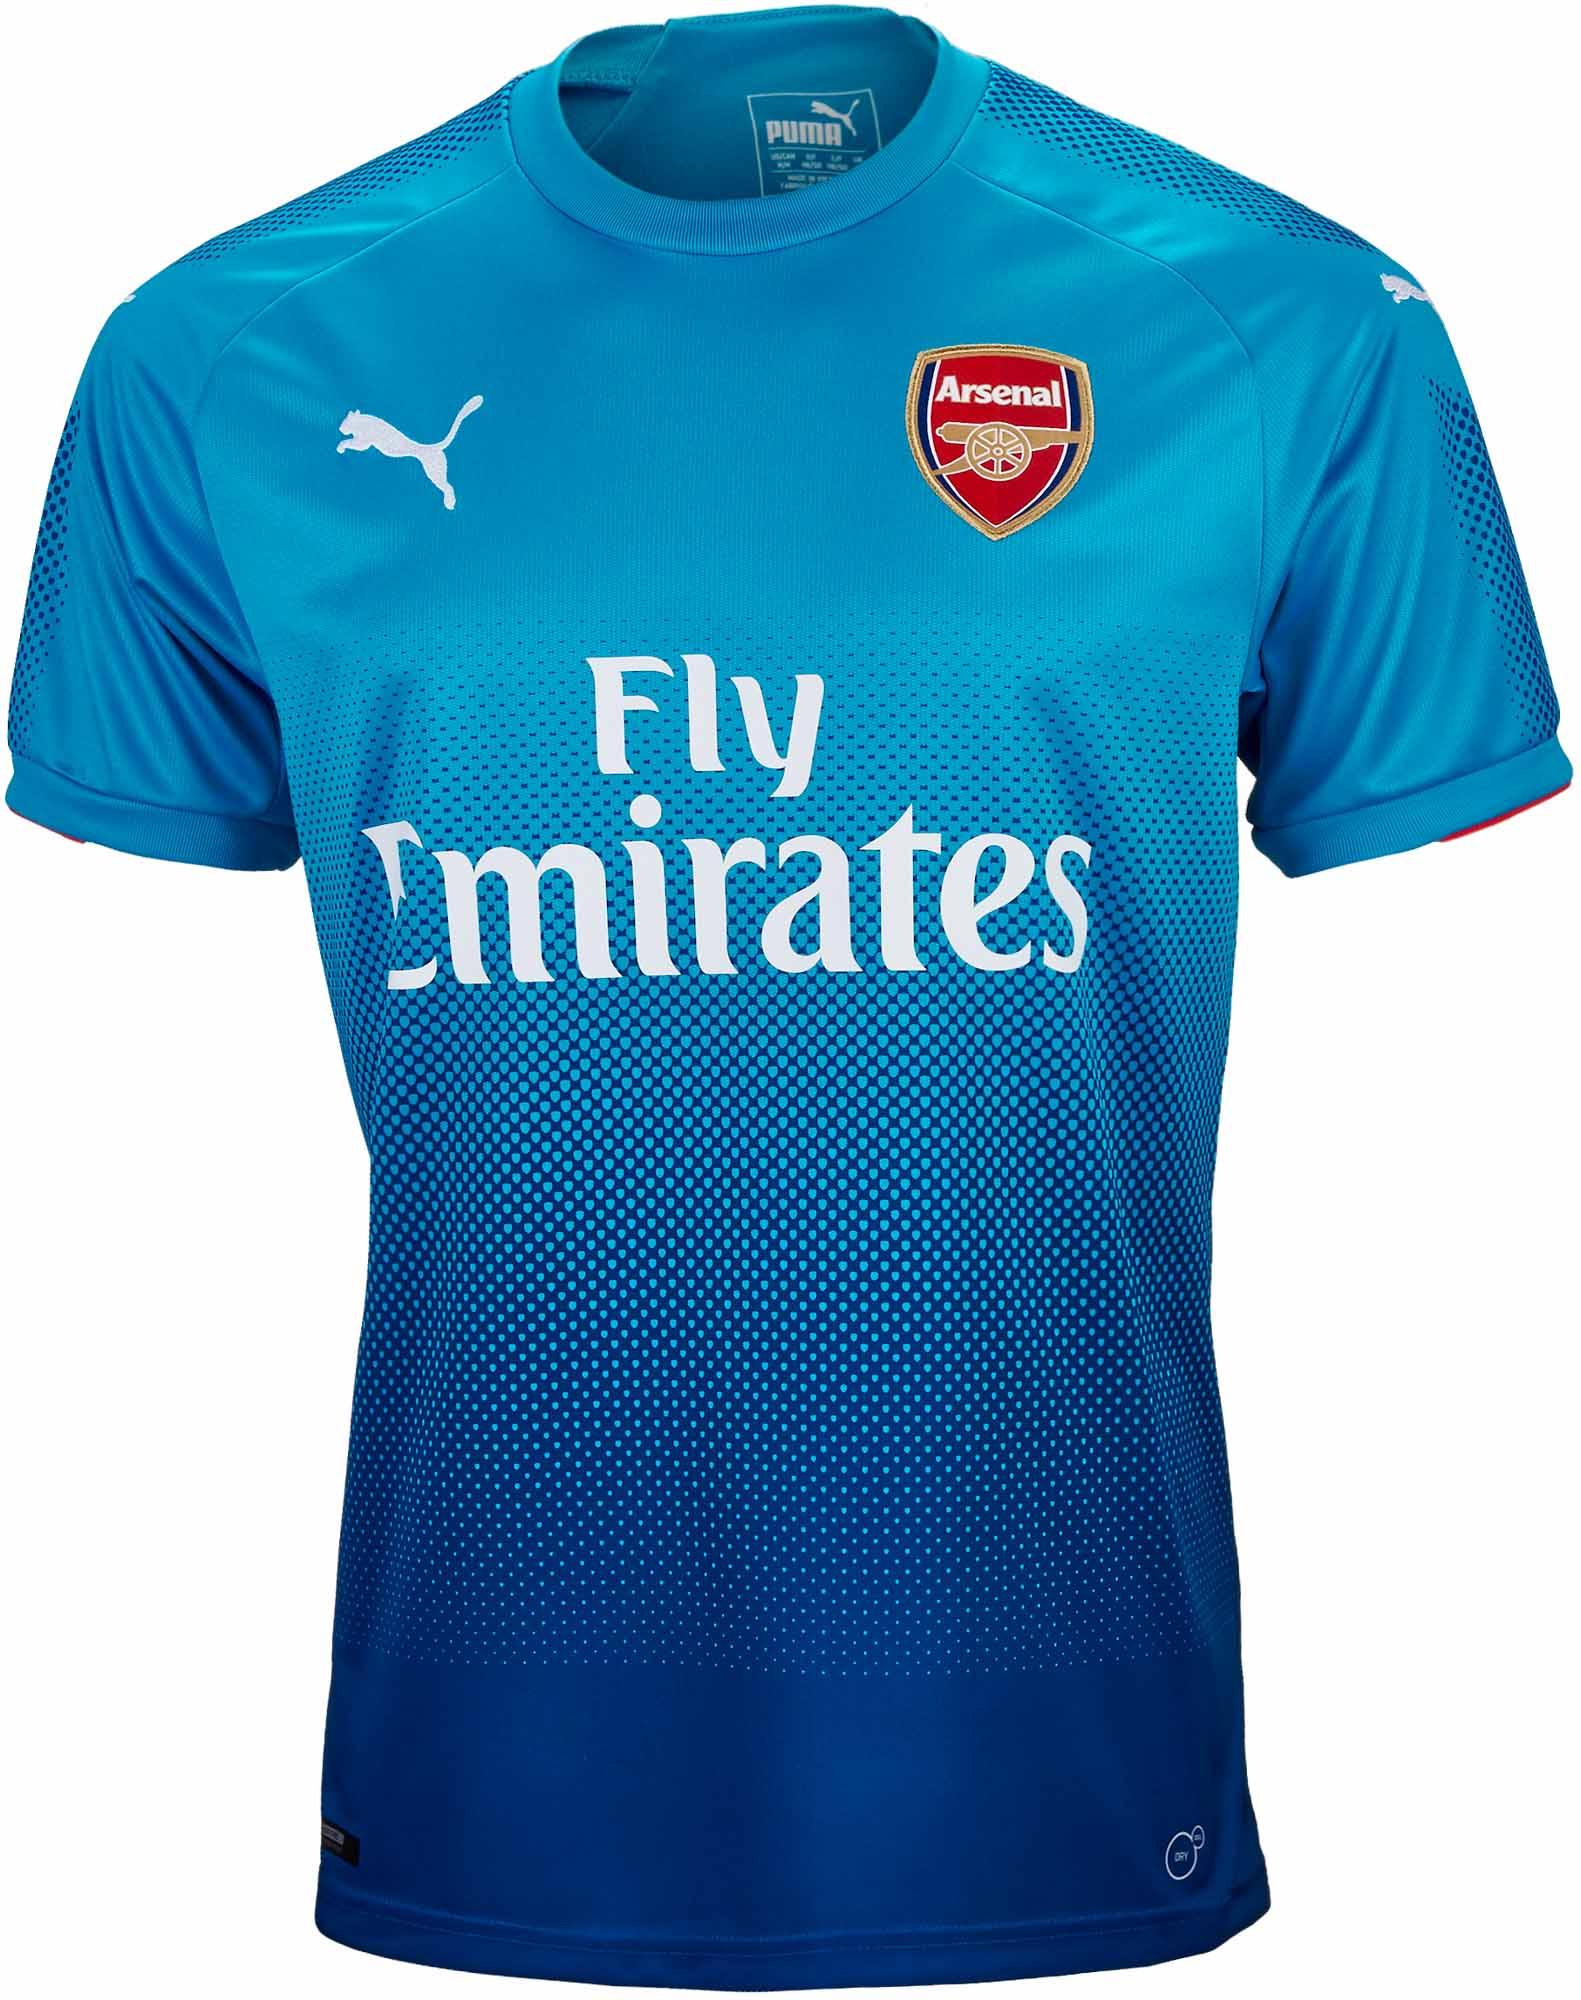 04f061bf0 Puma Arsenal Away Jersey - 2017 18 Soccer Jerseys